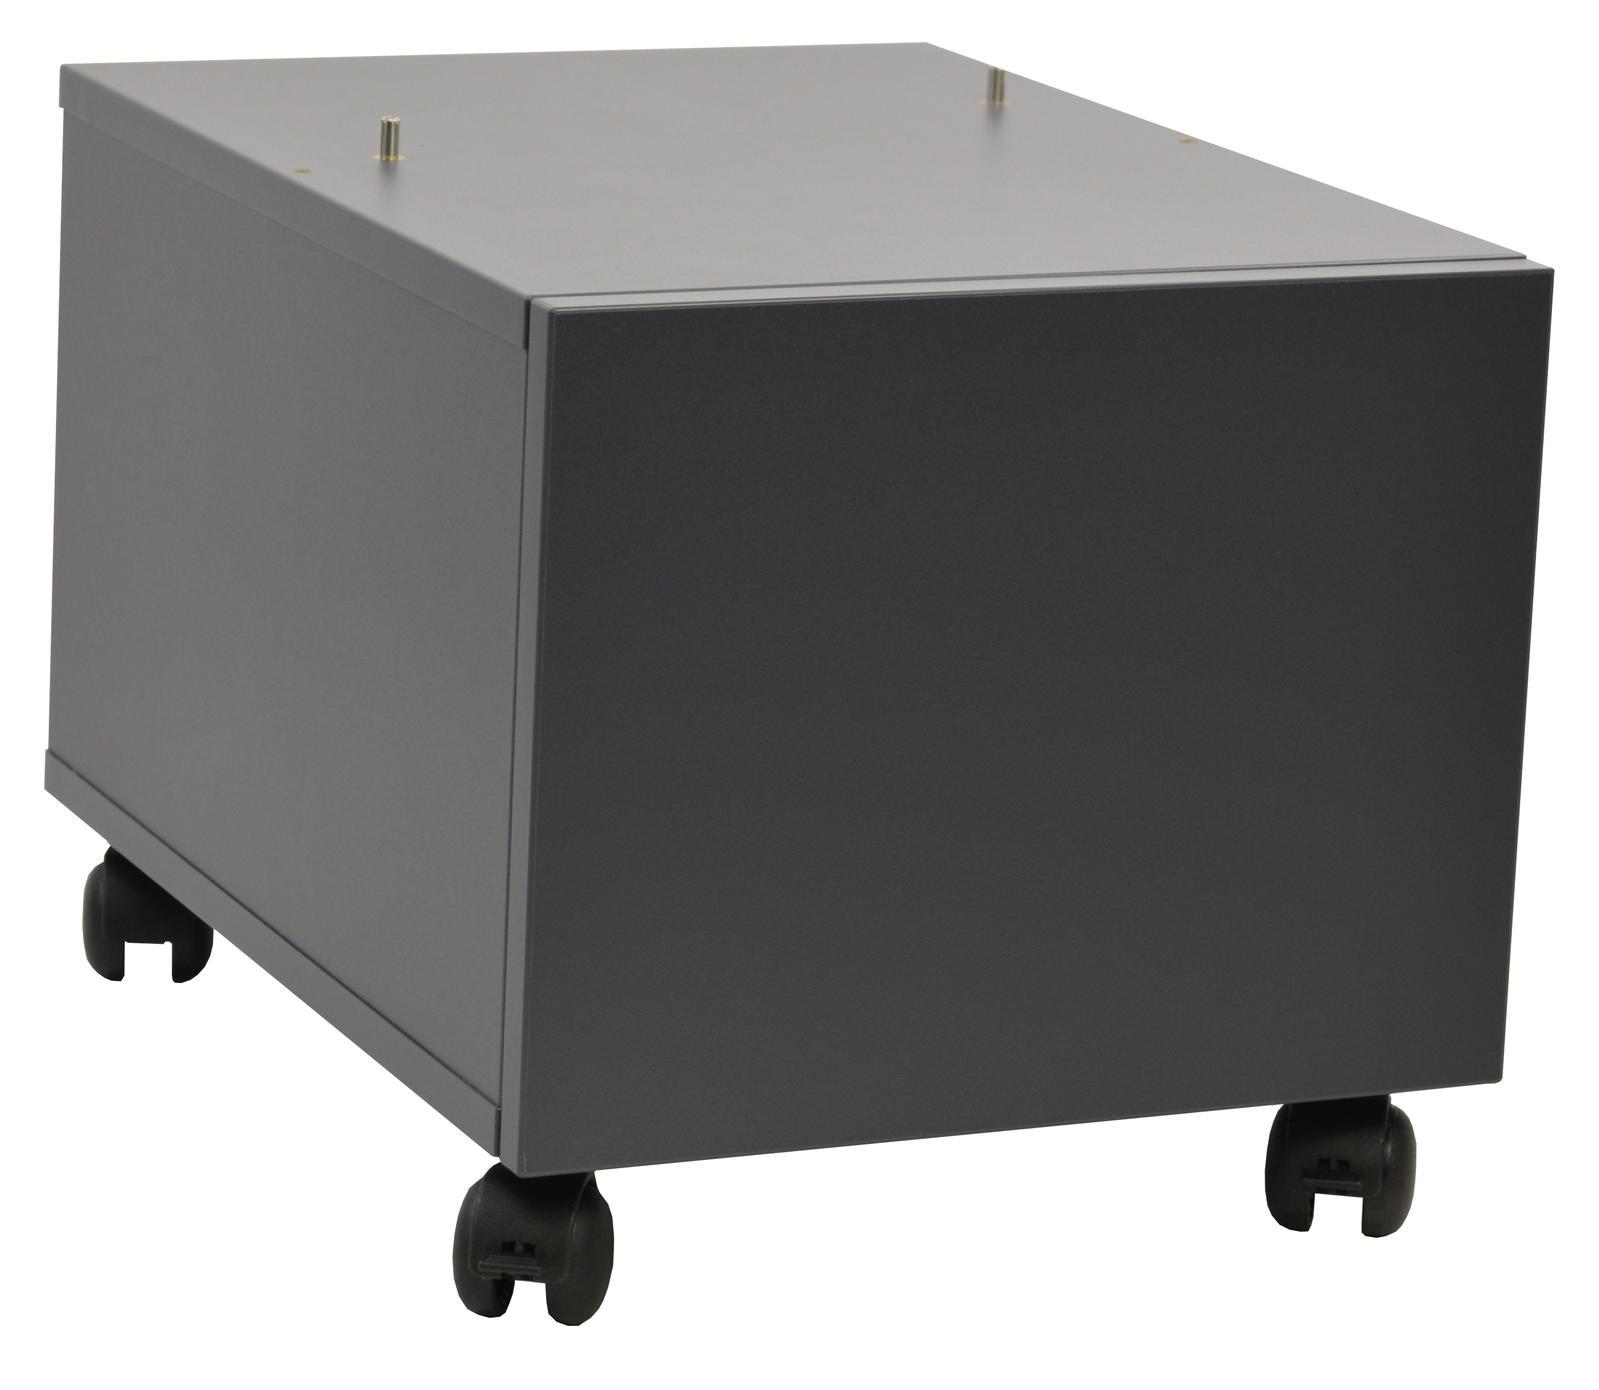 KYOCERA CB-5100LUnterschrank niedrig inkl. Rollen Höhe ca. 37 cm printer cabinet/stand Black,Grey